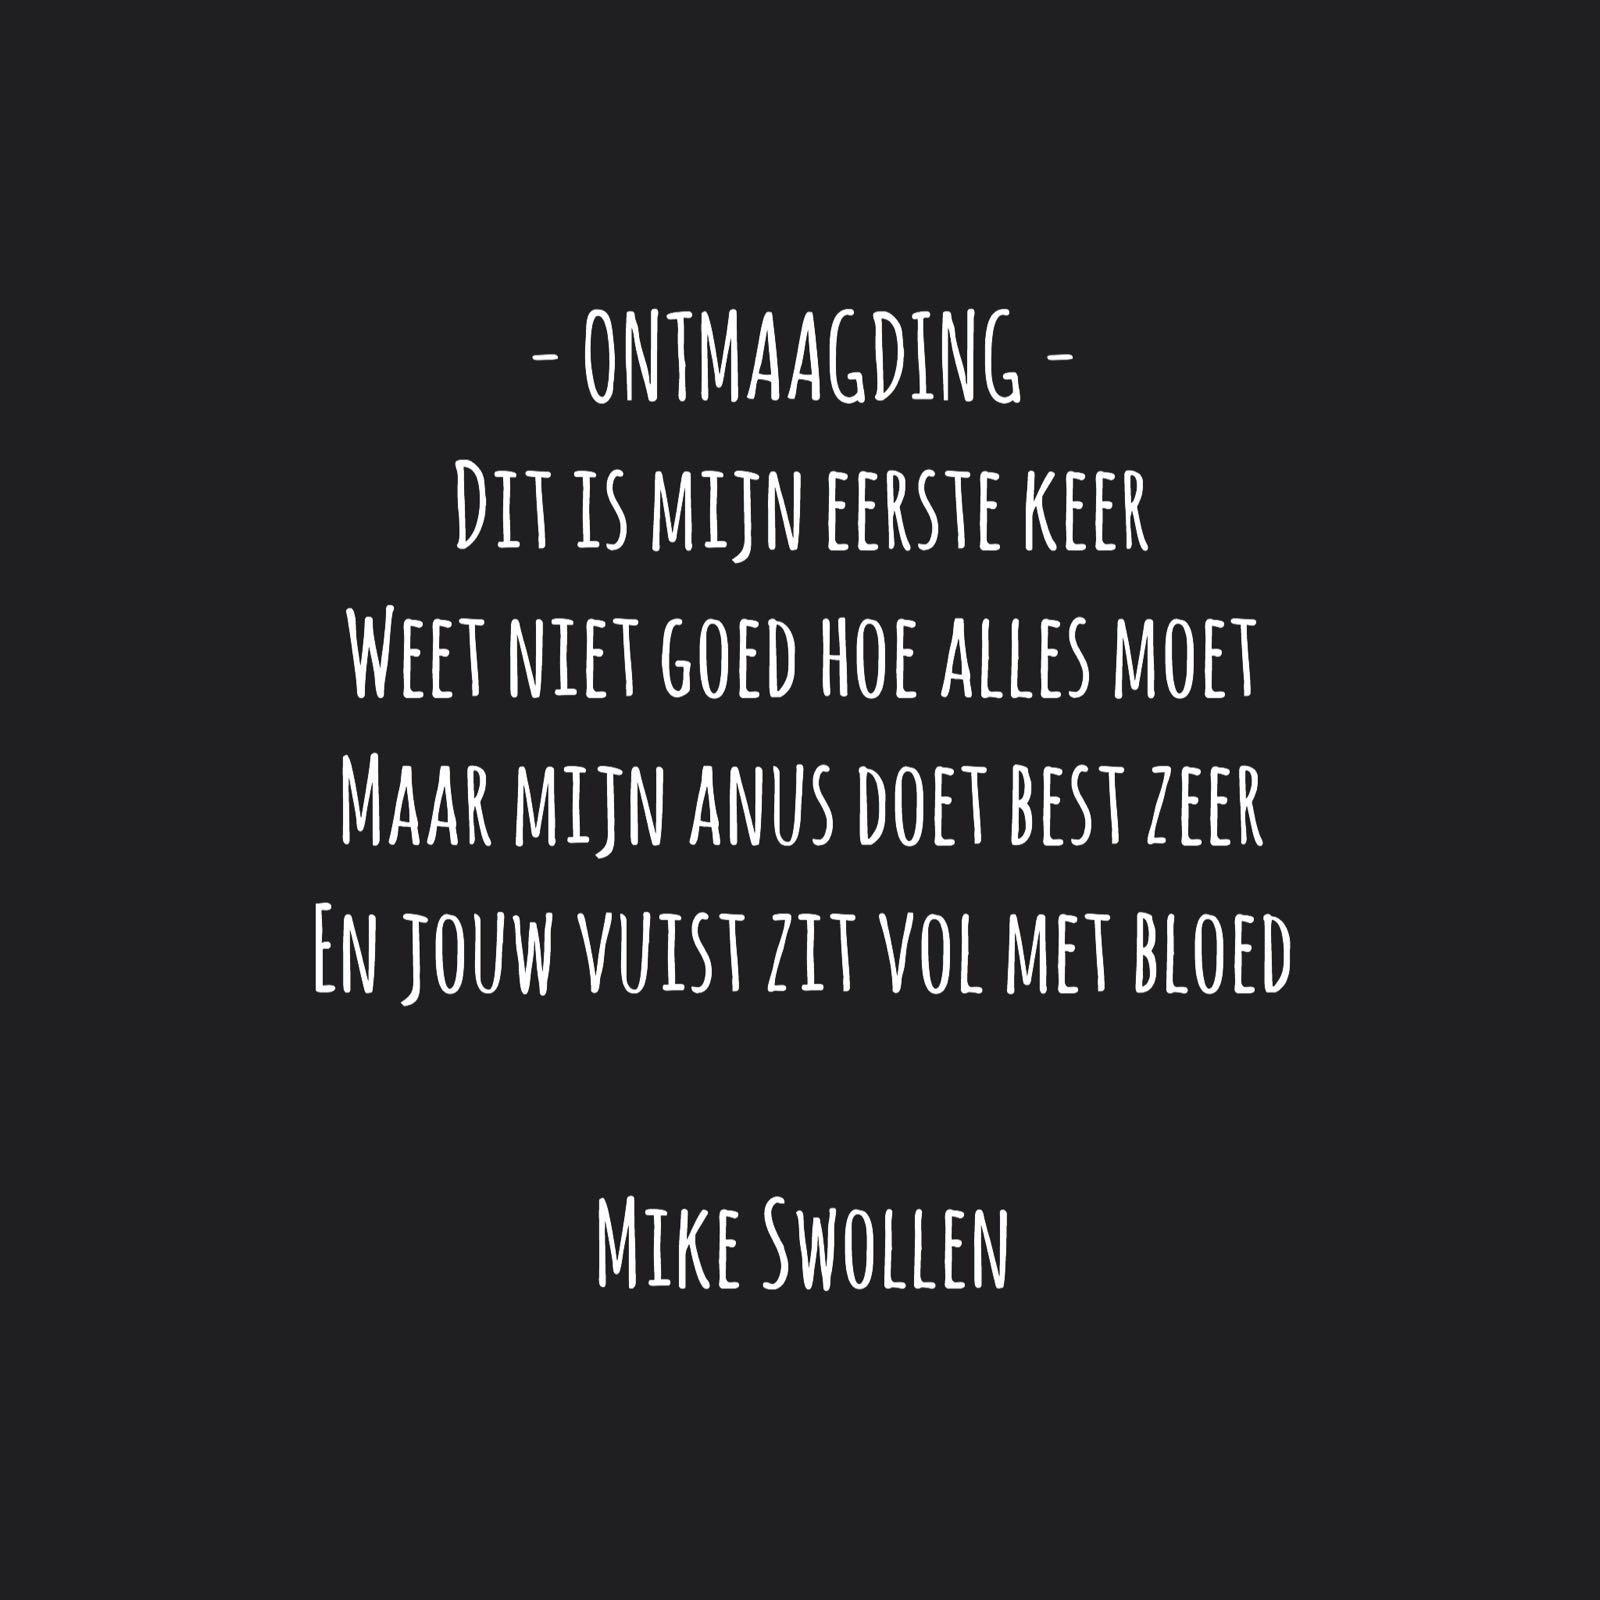 Swollinski gedicht Ontmaagding